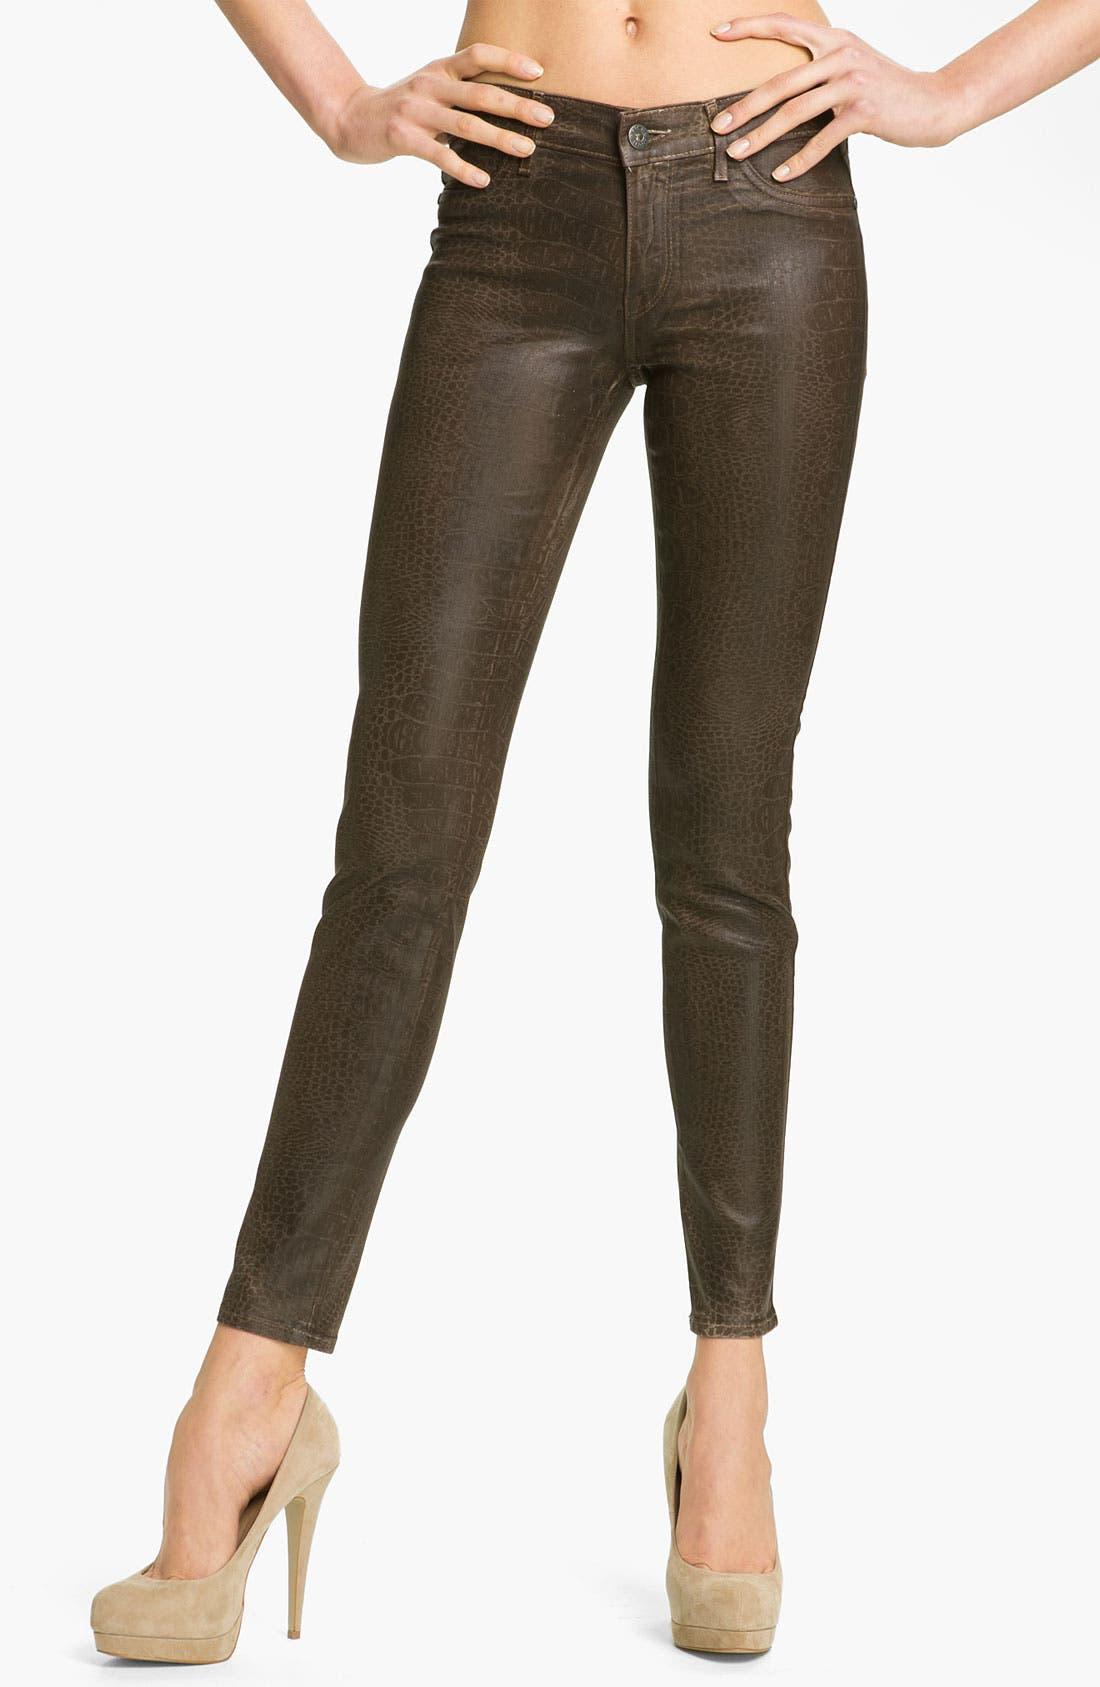 Alternate Image 1 Selected - Rich & Skinny 'Legacy' Coated Skinny Jeans (Marsh Croc)